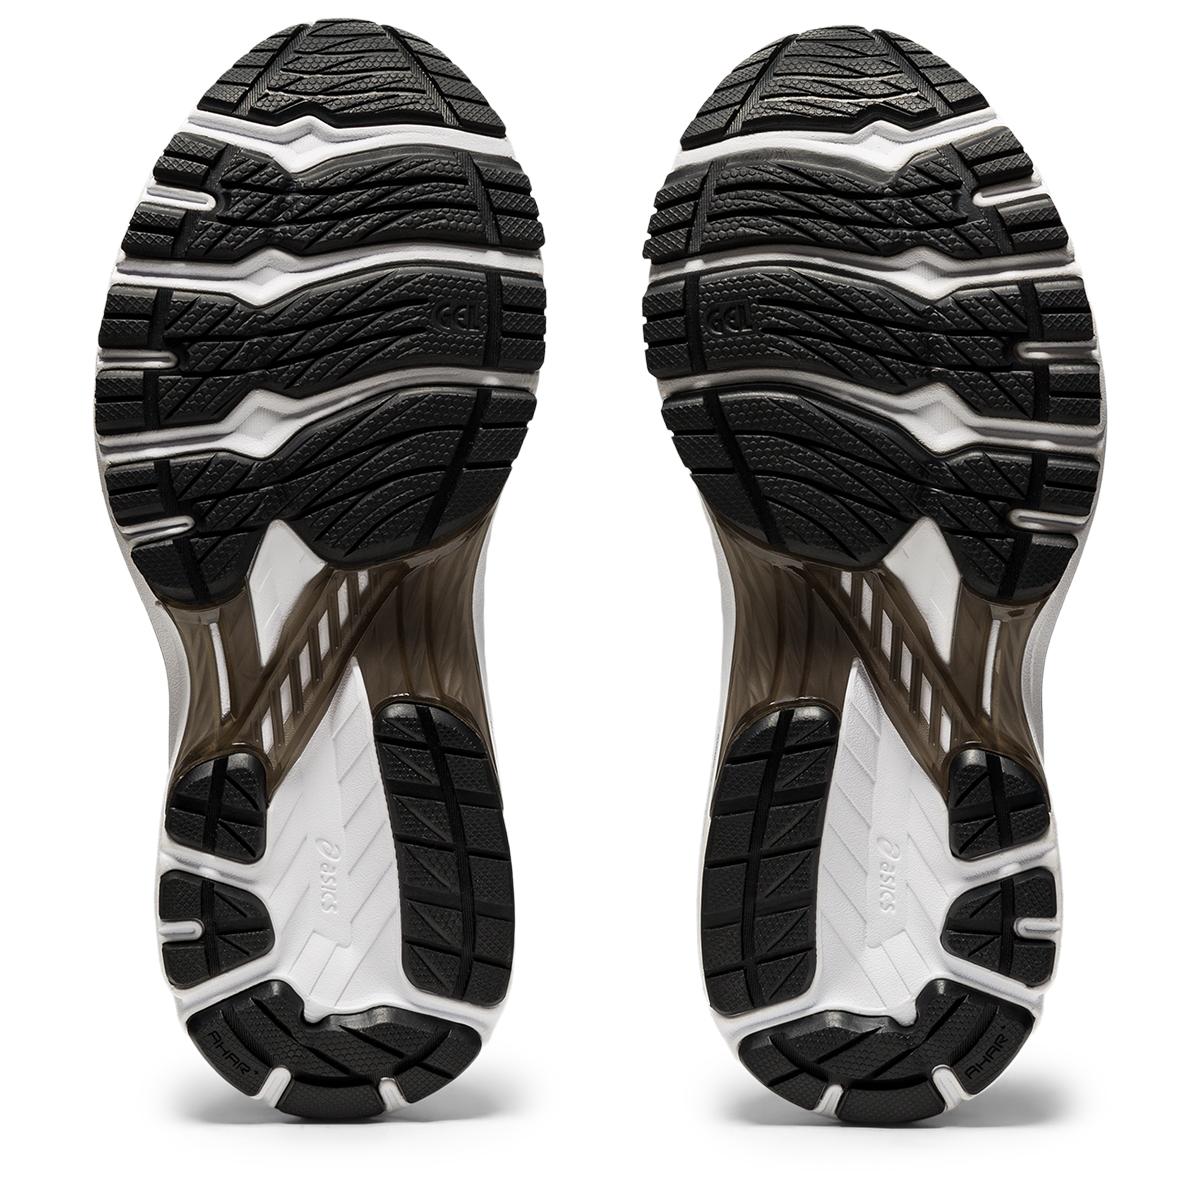 Women's Asics Gt-2000 9 Running Shoe - Color: Black/White - Size: 5 - Width: Regular, Black/White, large, image 6